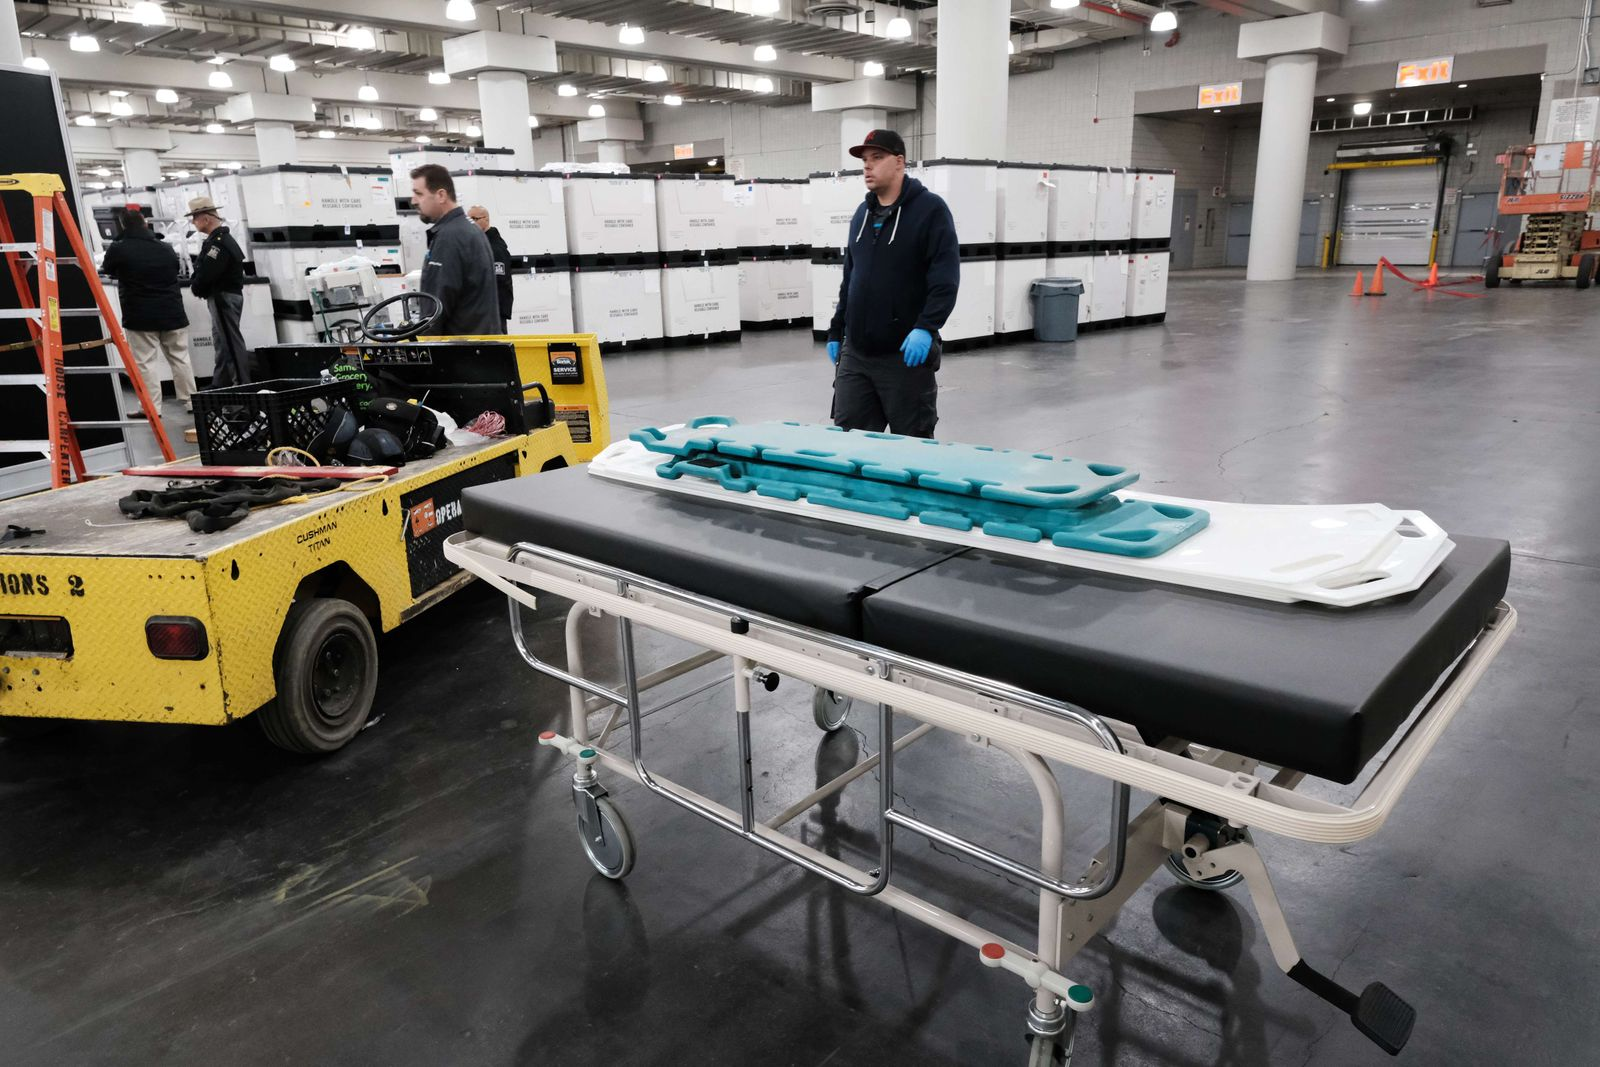 New York Governor Andrew Cuomo Tours Temporary FEMA Hospital Being Setup At Javits Convention Center